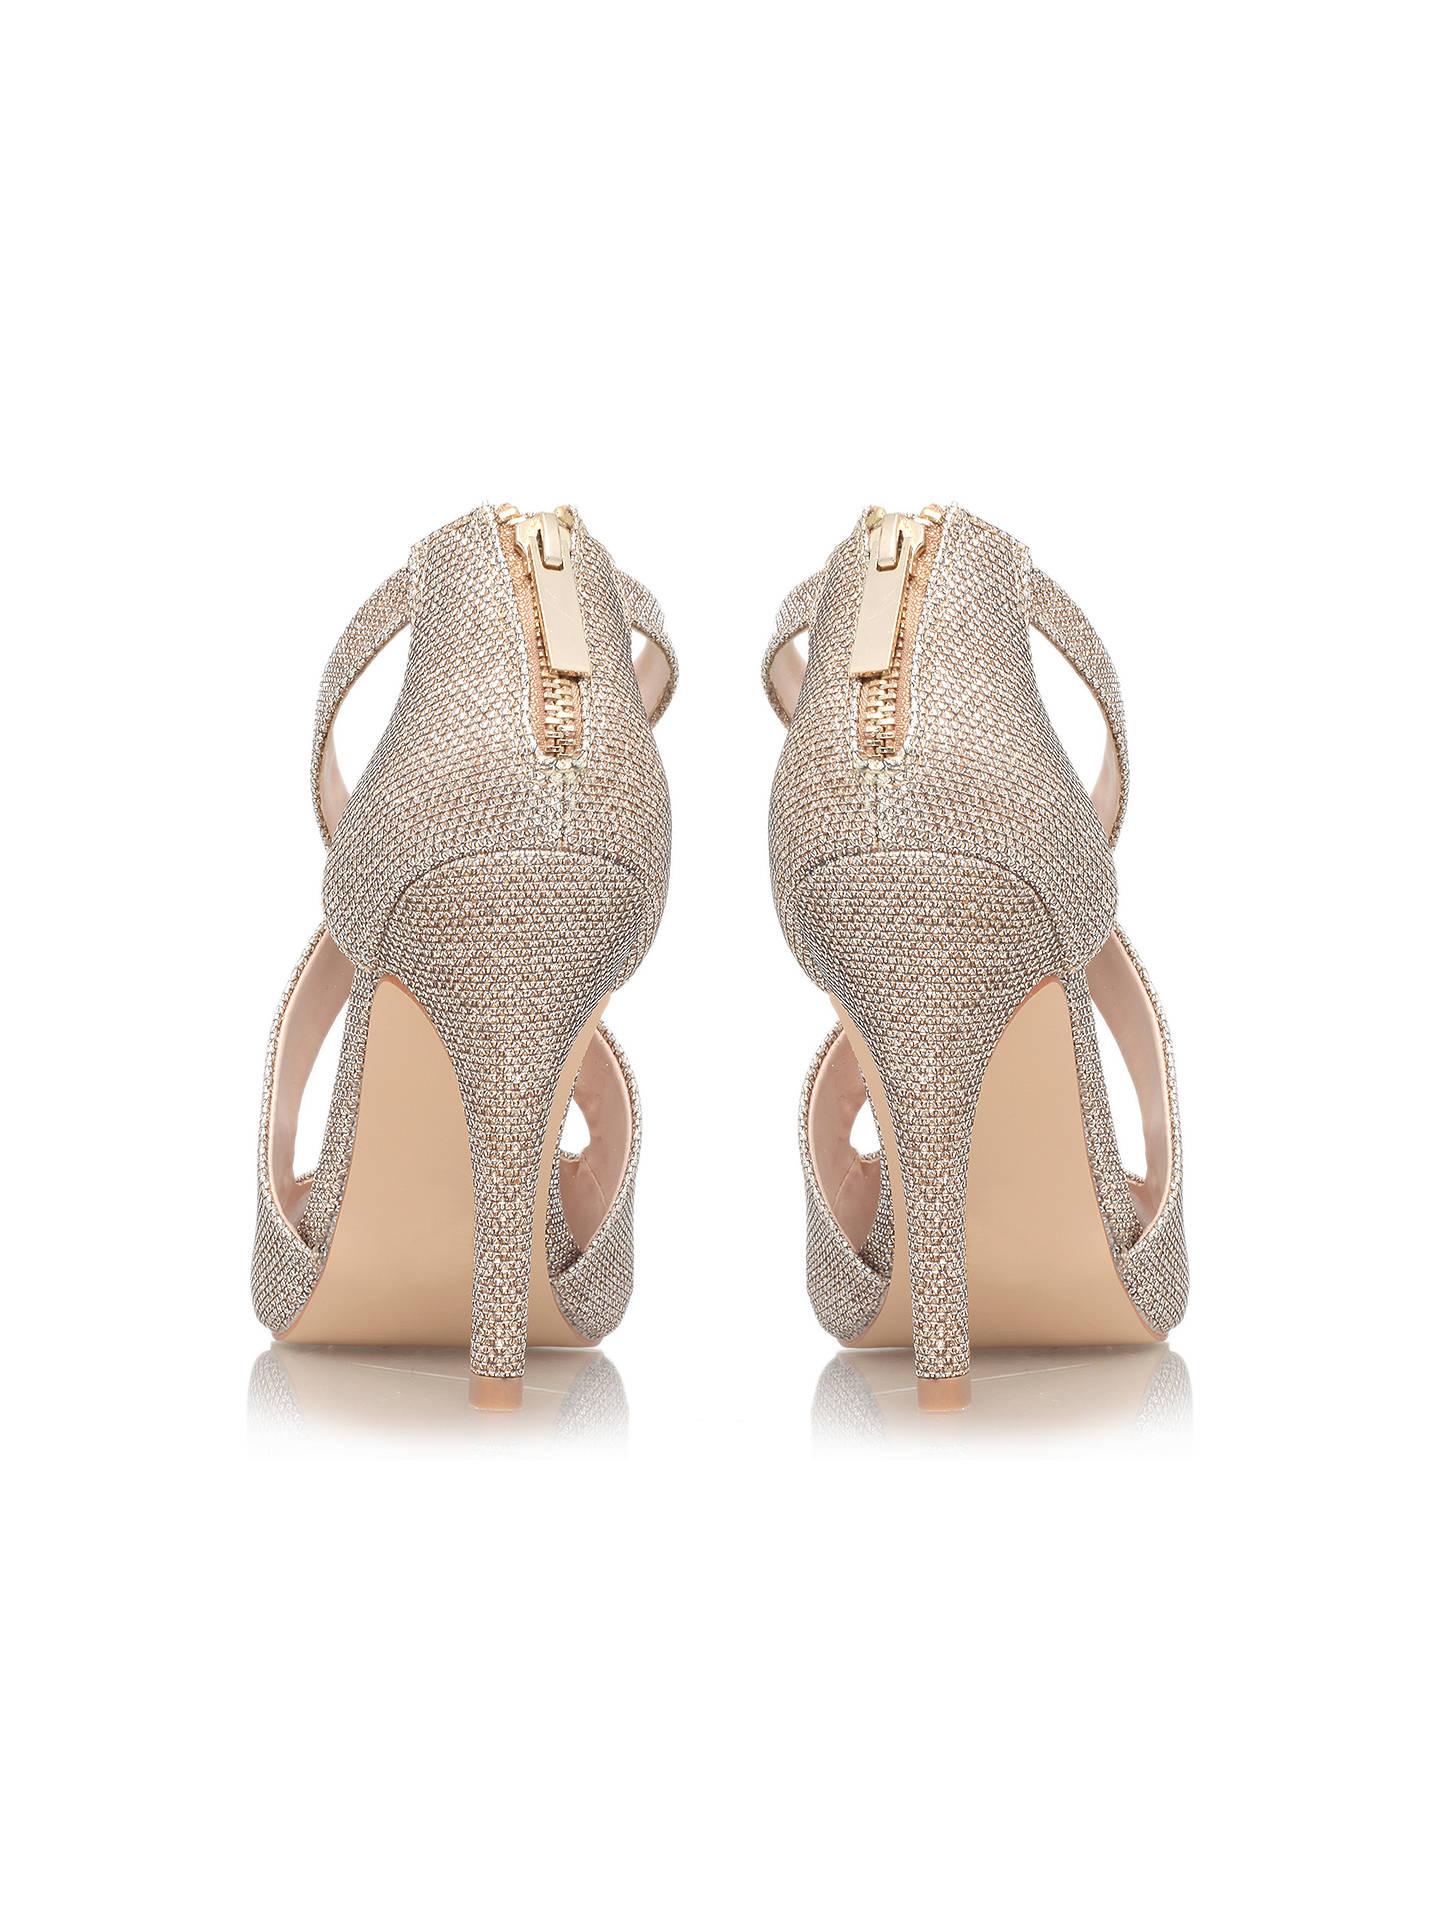 8764db8c4f4 Buy Miss KG Shae Occasion Stiletto Heeled Sandals